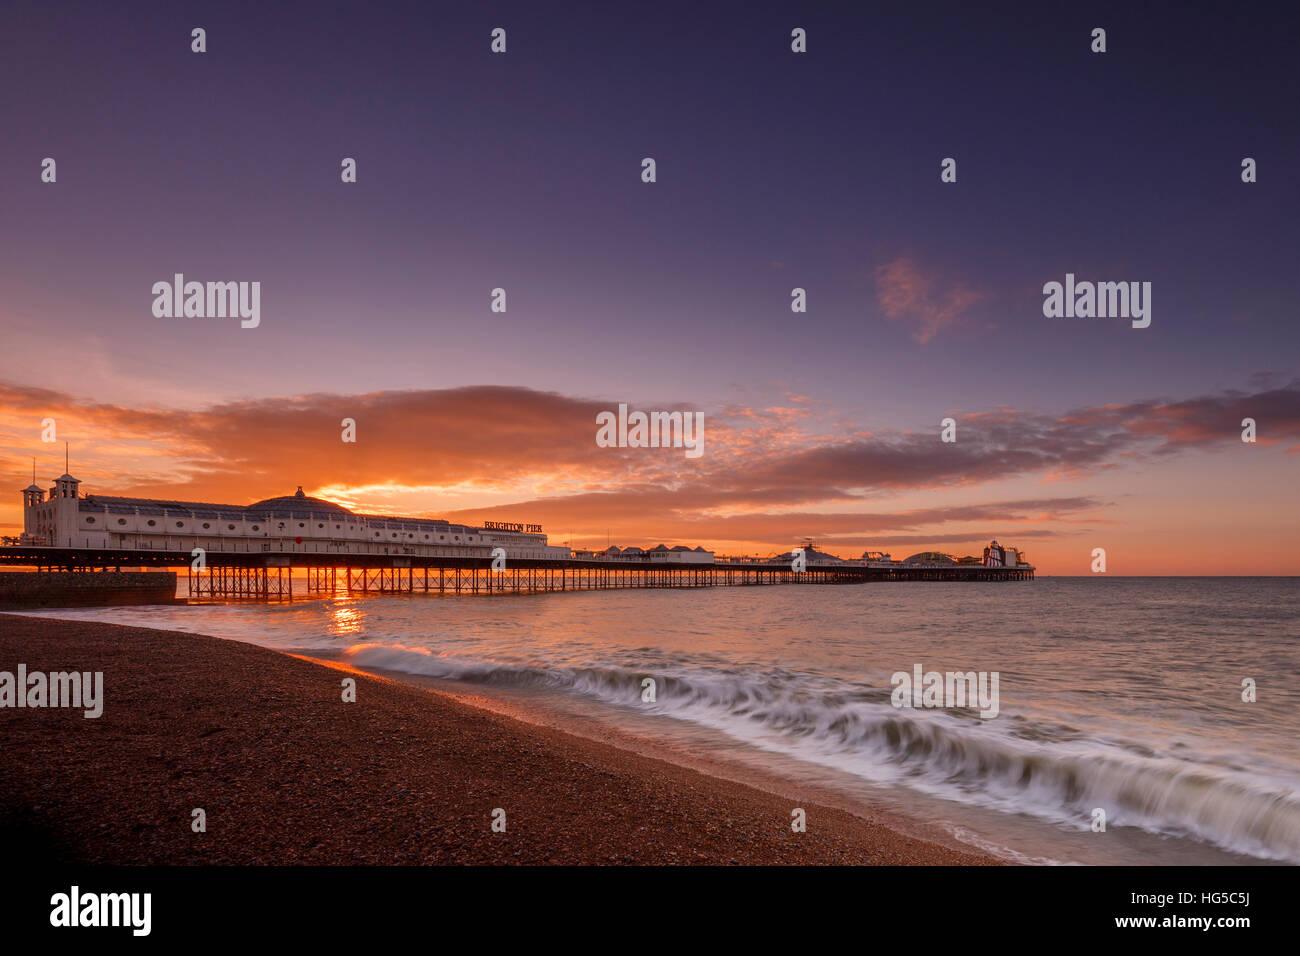 Brighton Pier and beach at sunrise, Brighton, East Sussex, Sussex, England, United Kingdom - Stock Image